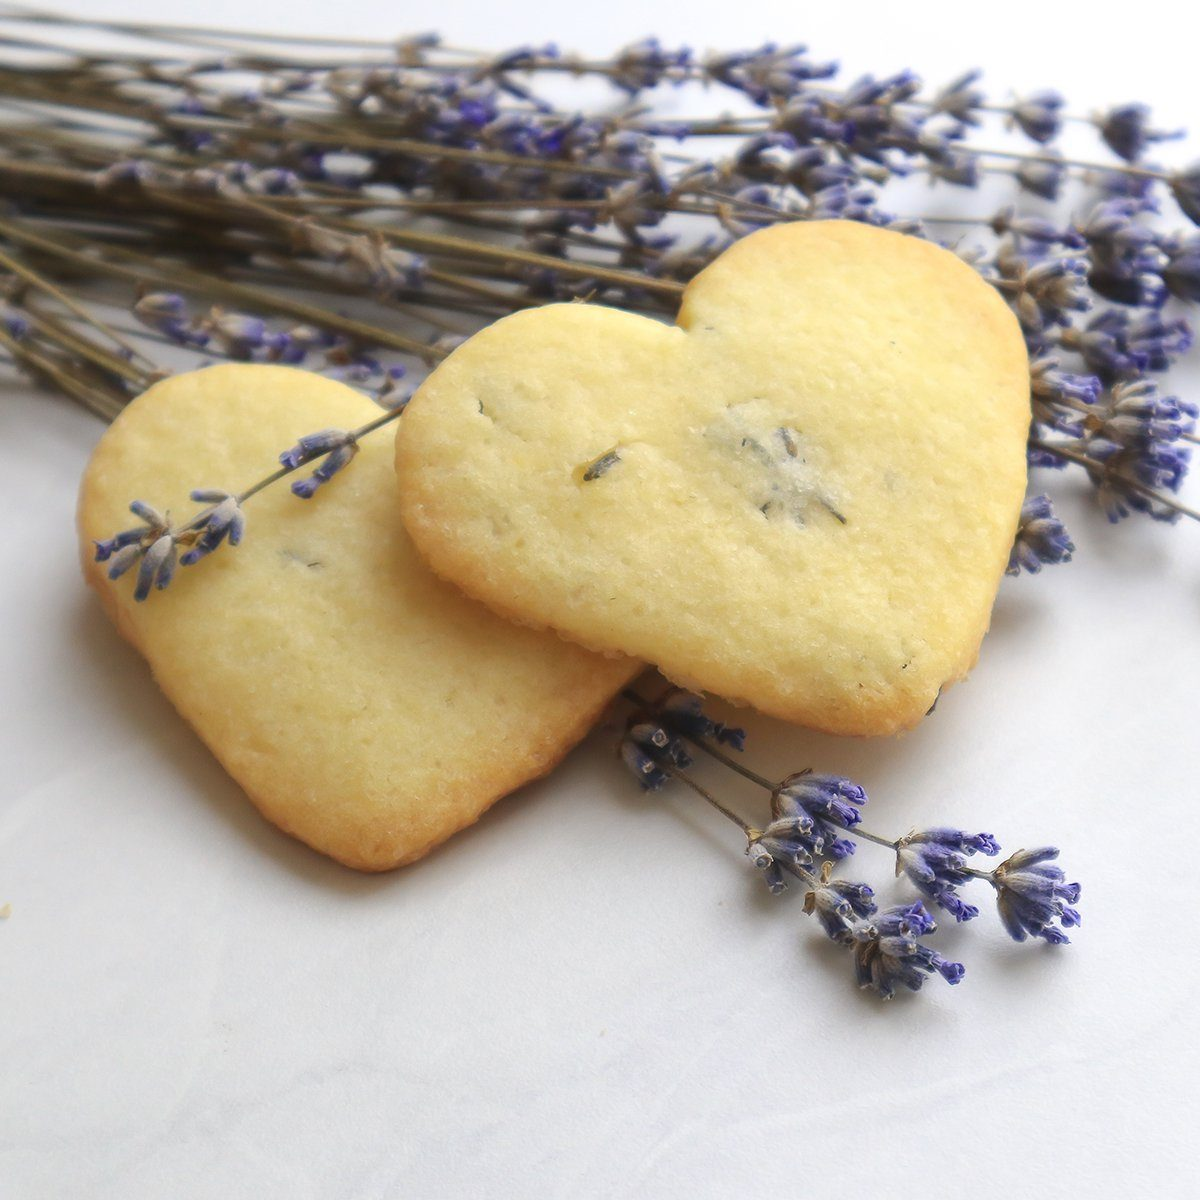 Fresh homemade lavender cookies on light background